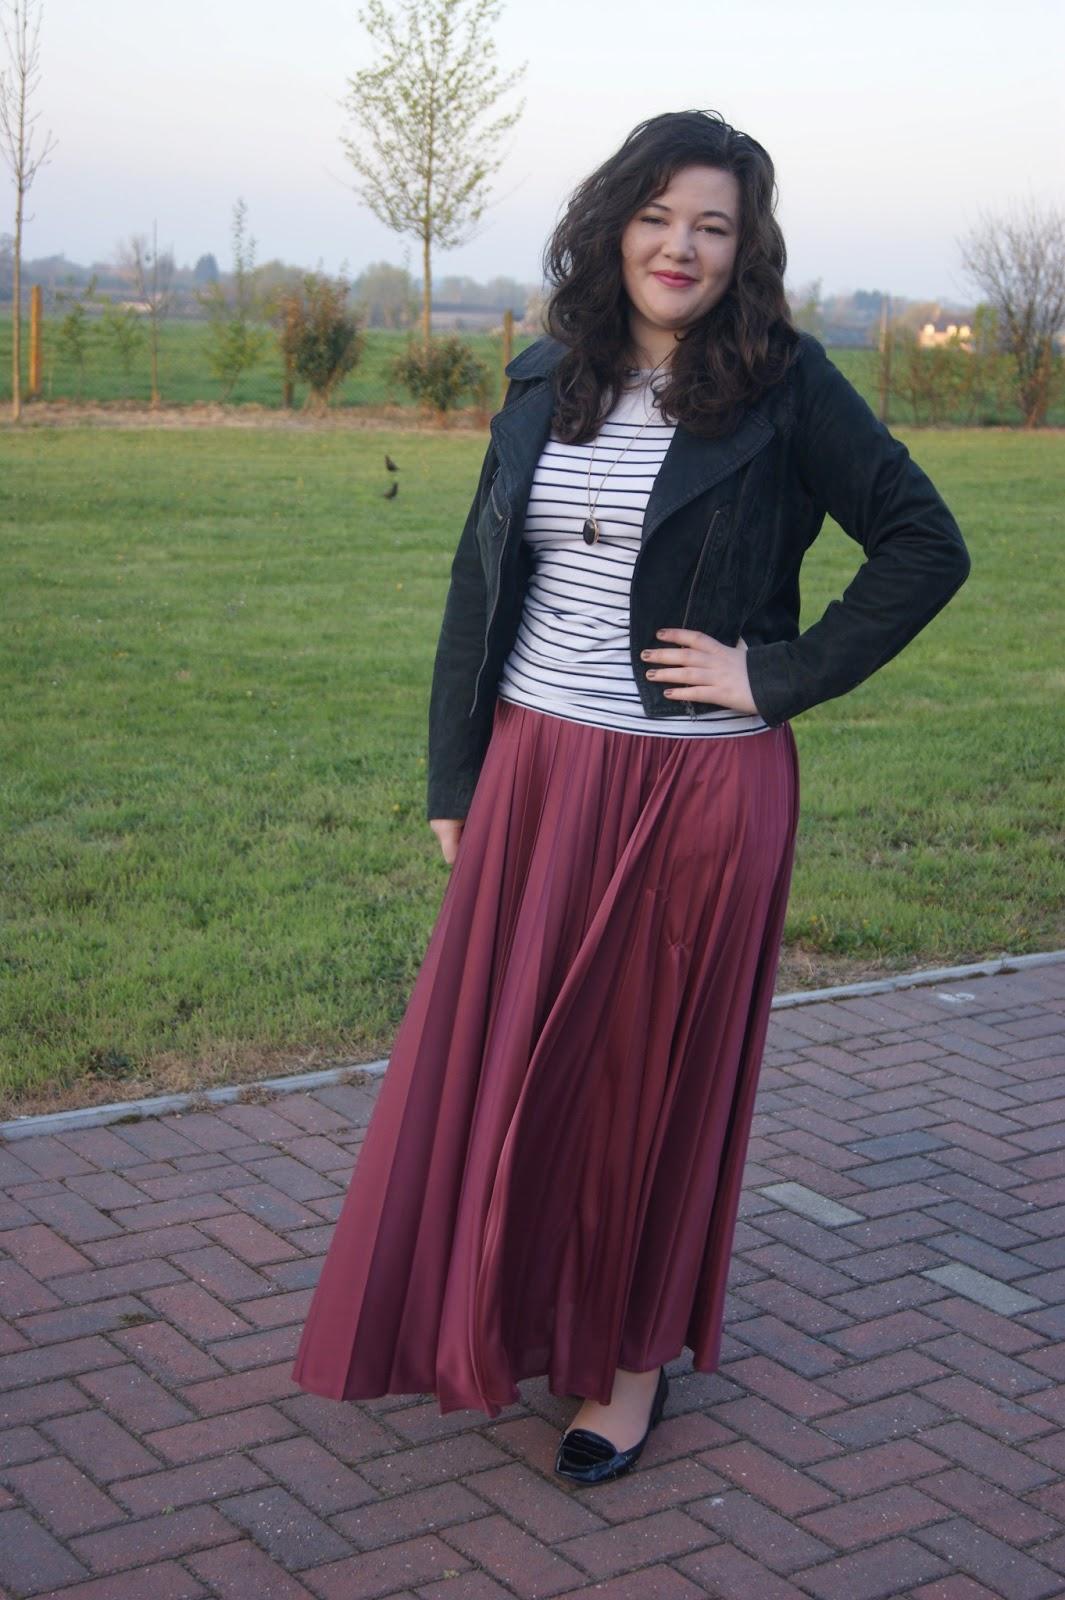 Styling a maxi skirt for work... | Frills u0026#39;nu0026#39; Spills